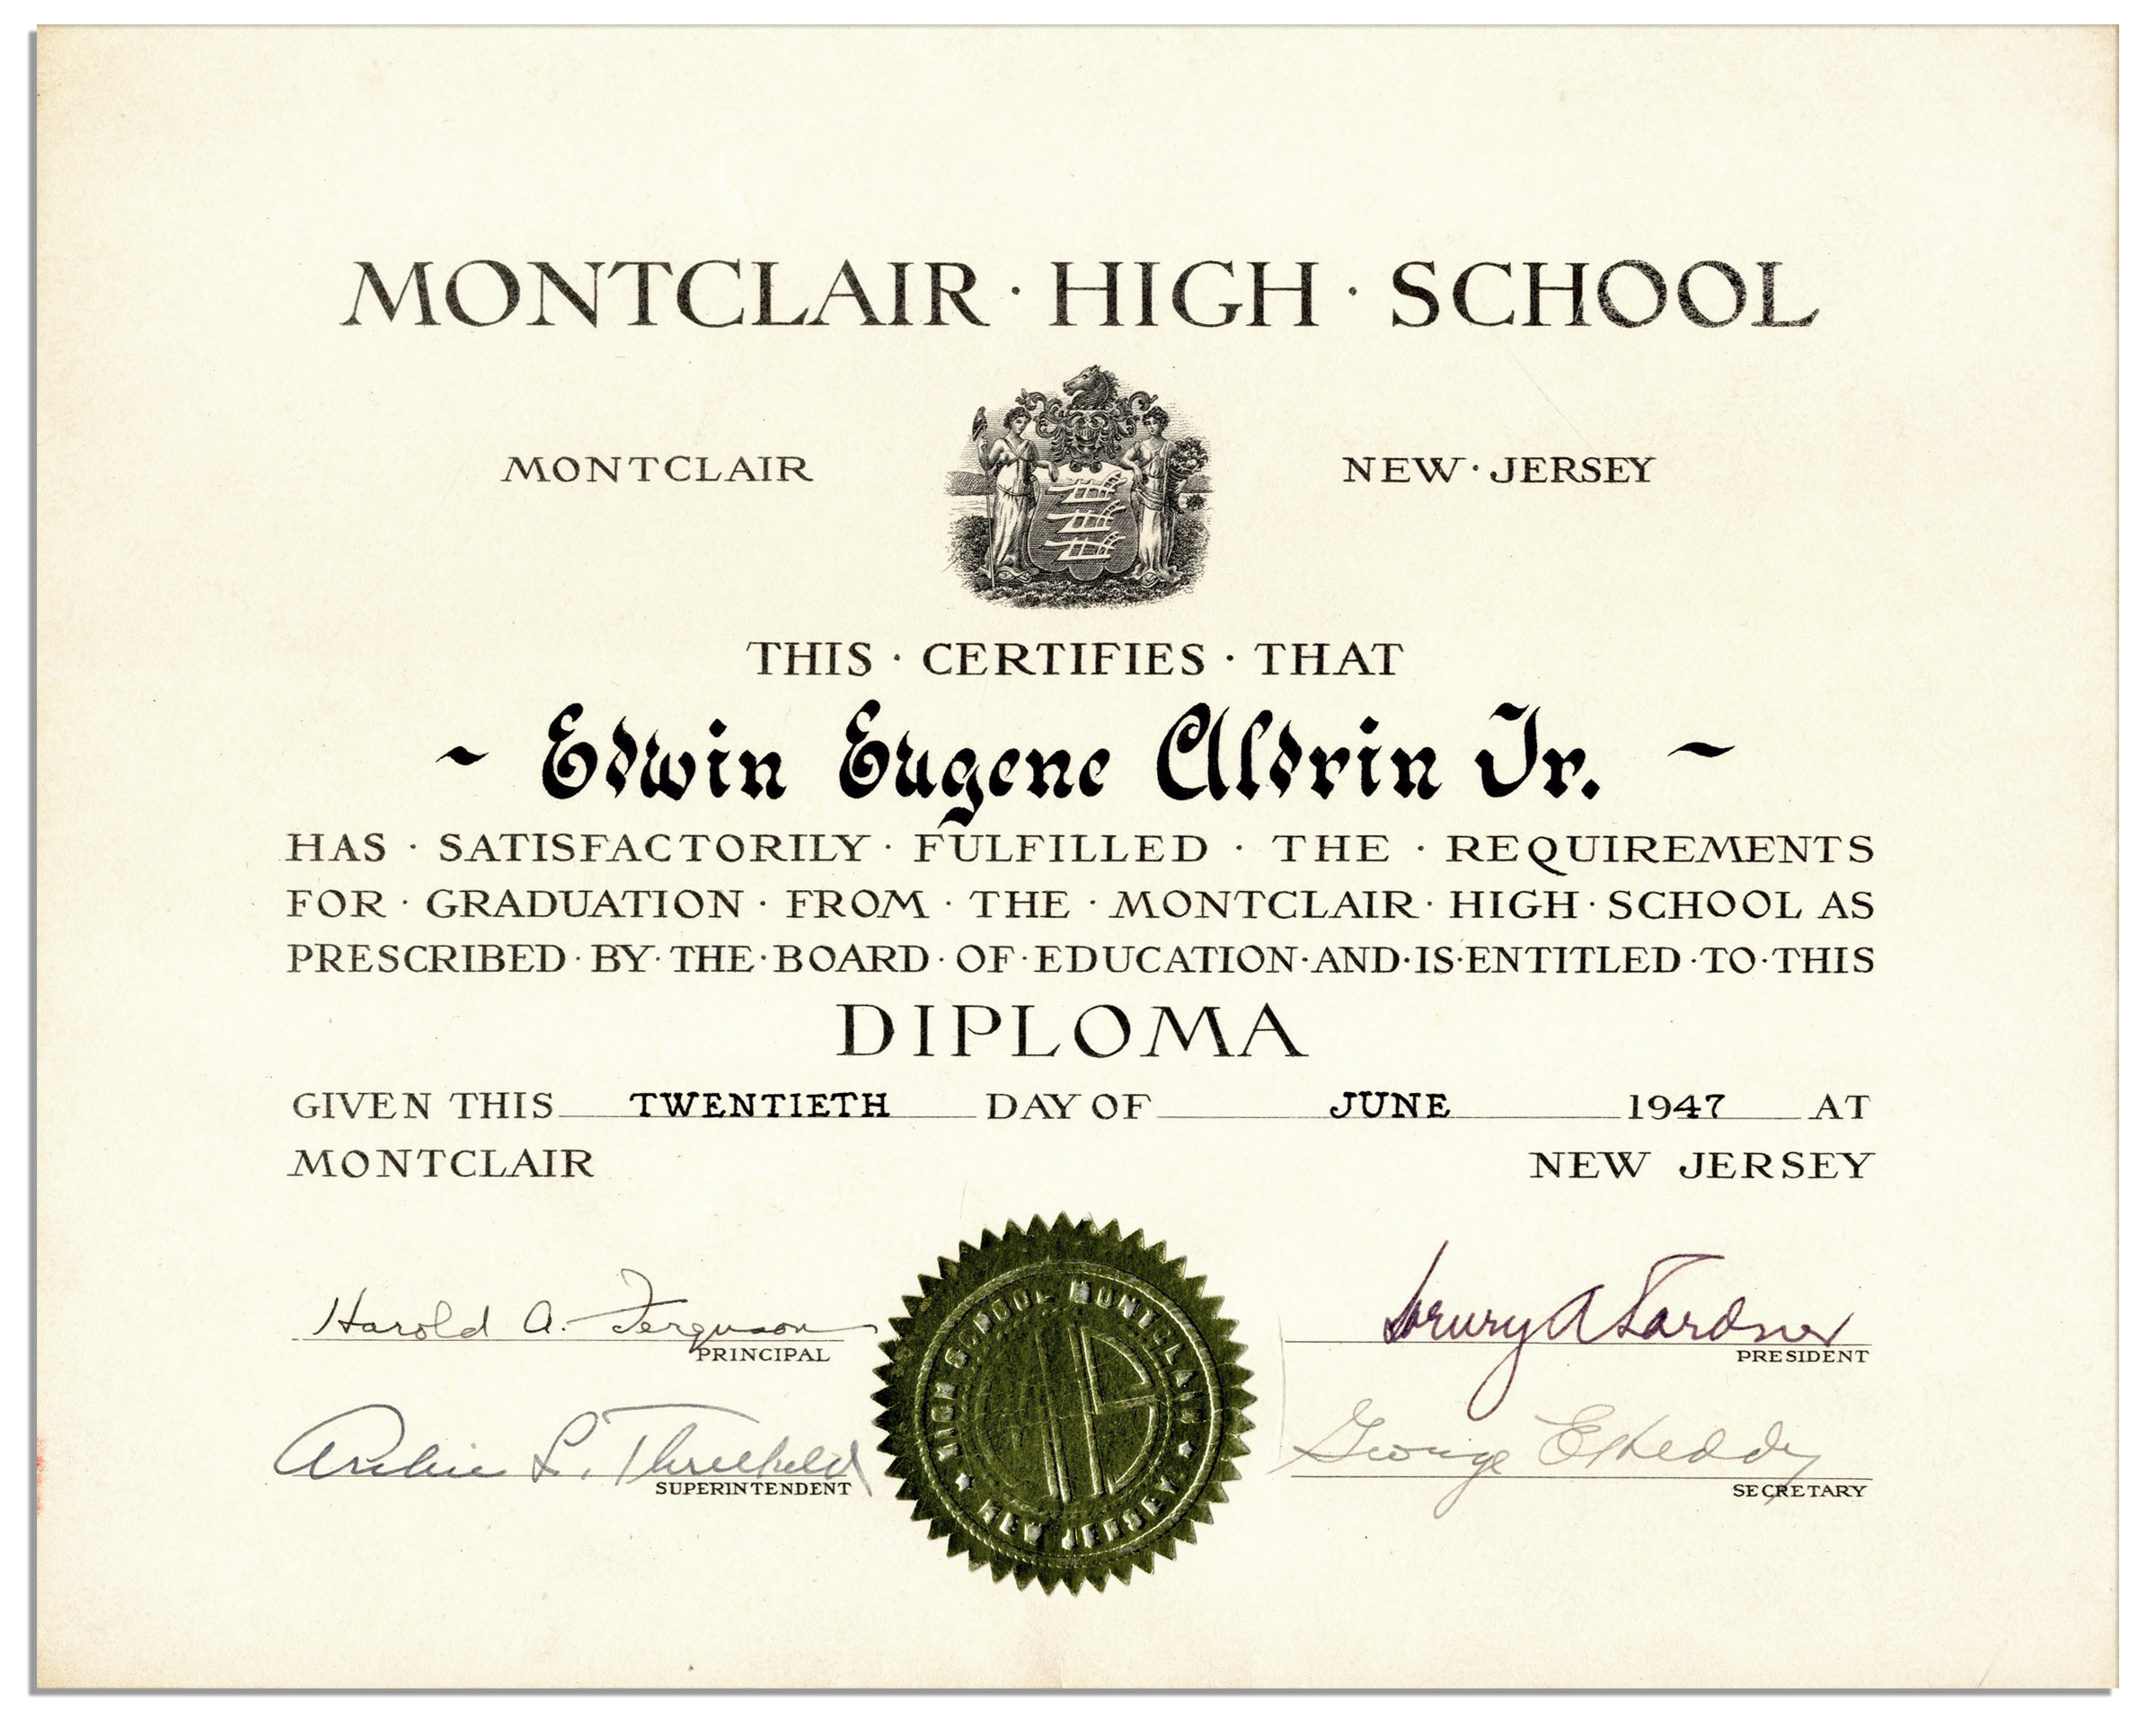 lot detail buzz aldrin high school diploma